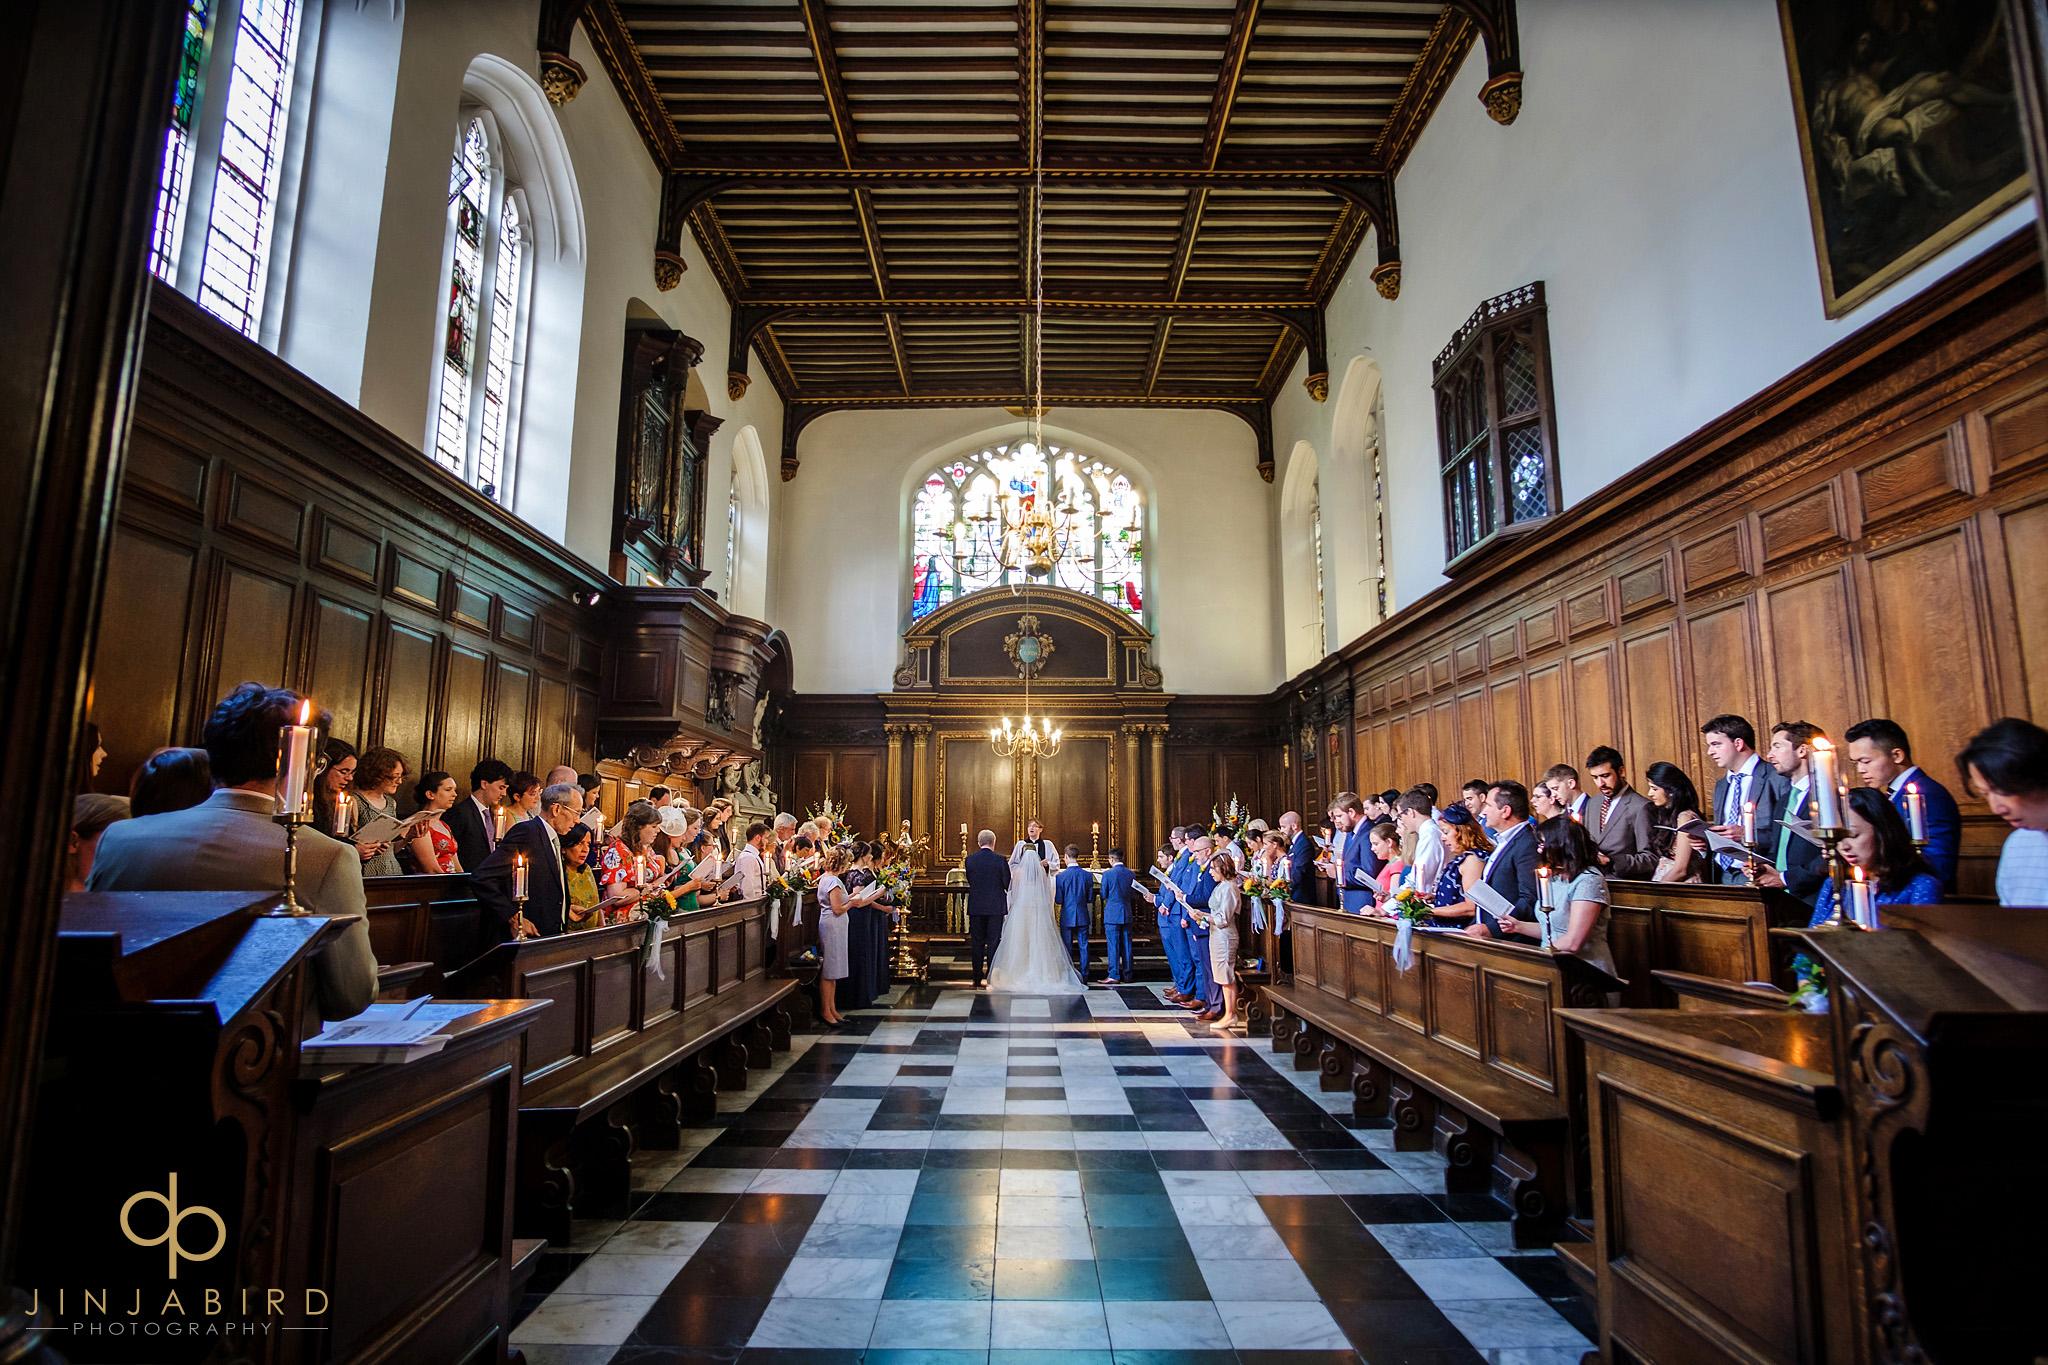 christs college wedding ceremony